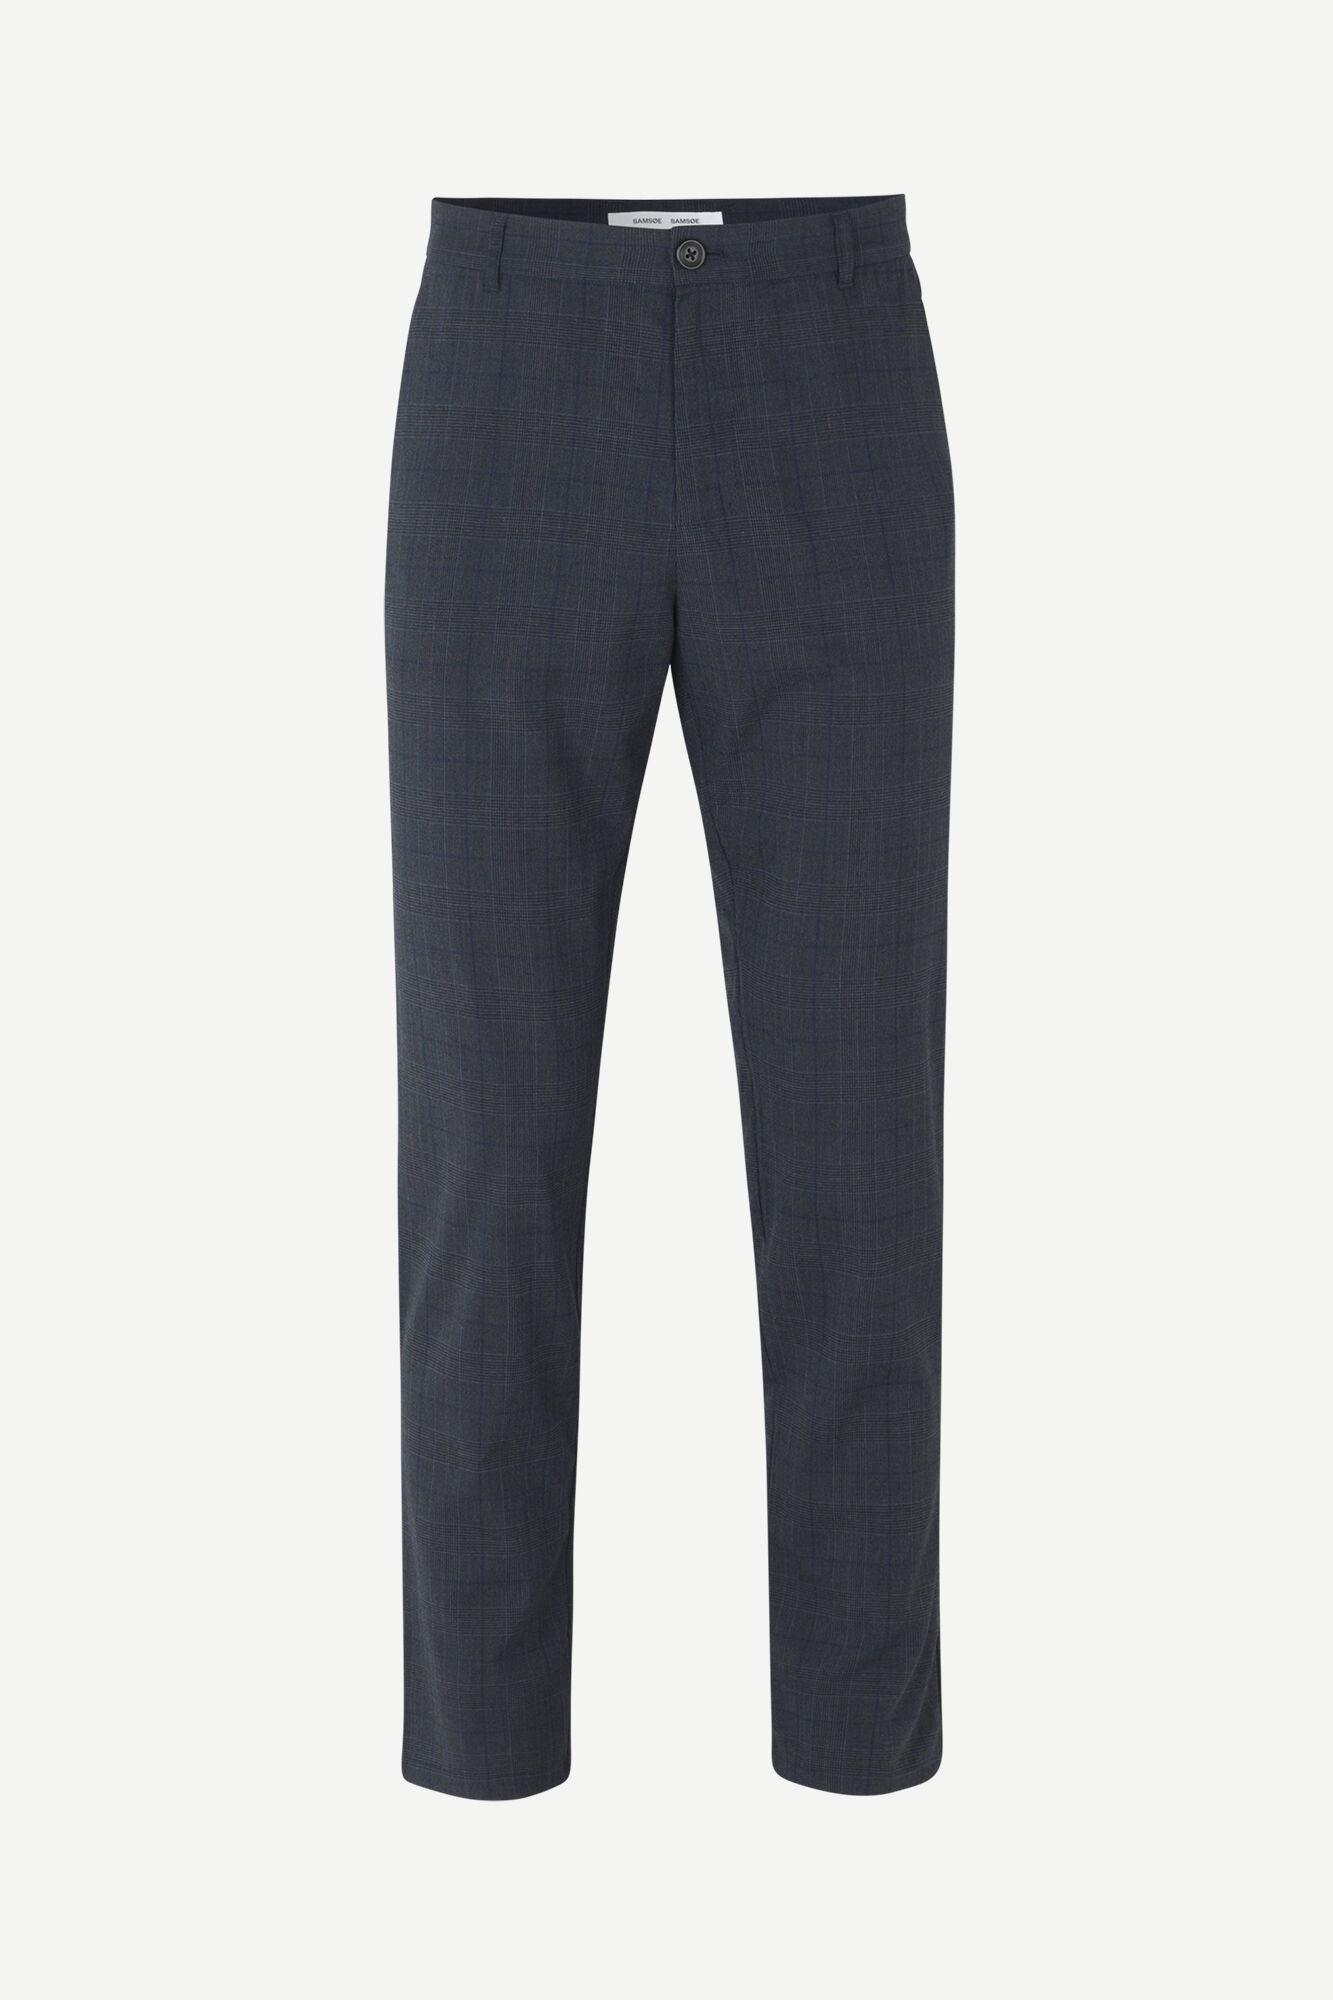 Frankie Regular Fit broek blauw geruit 11538-1